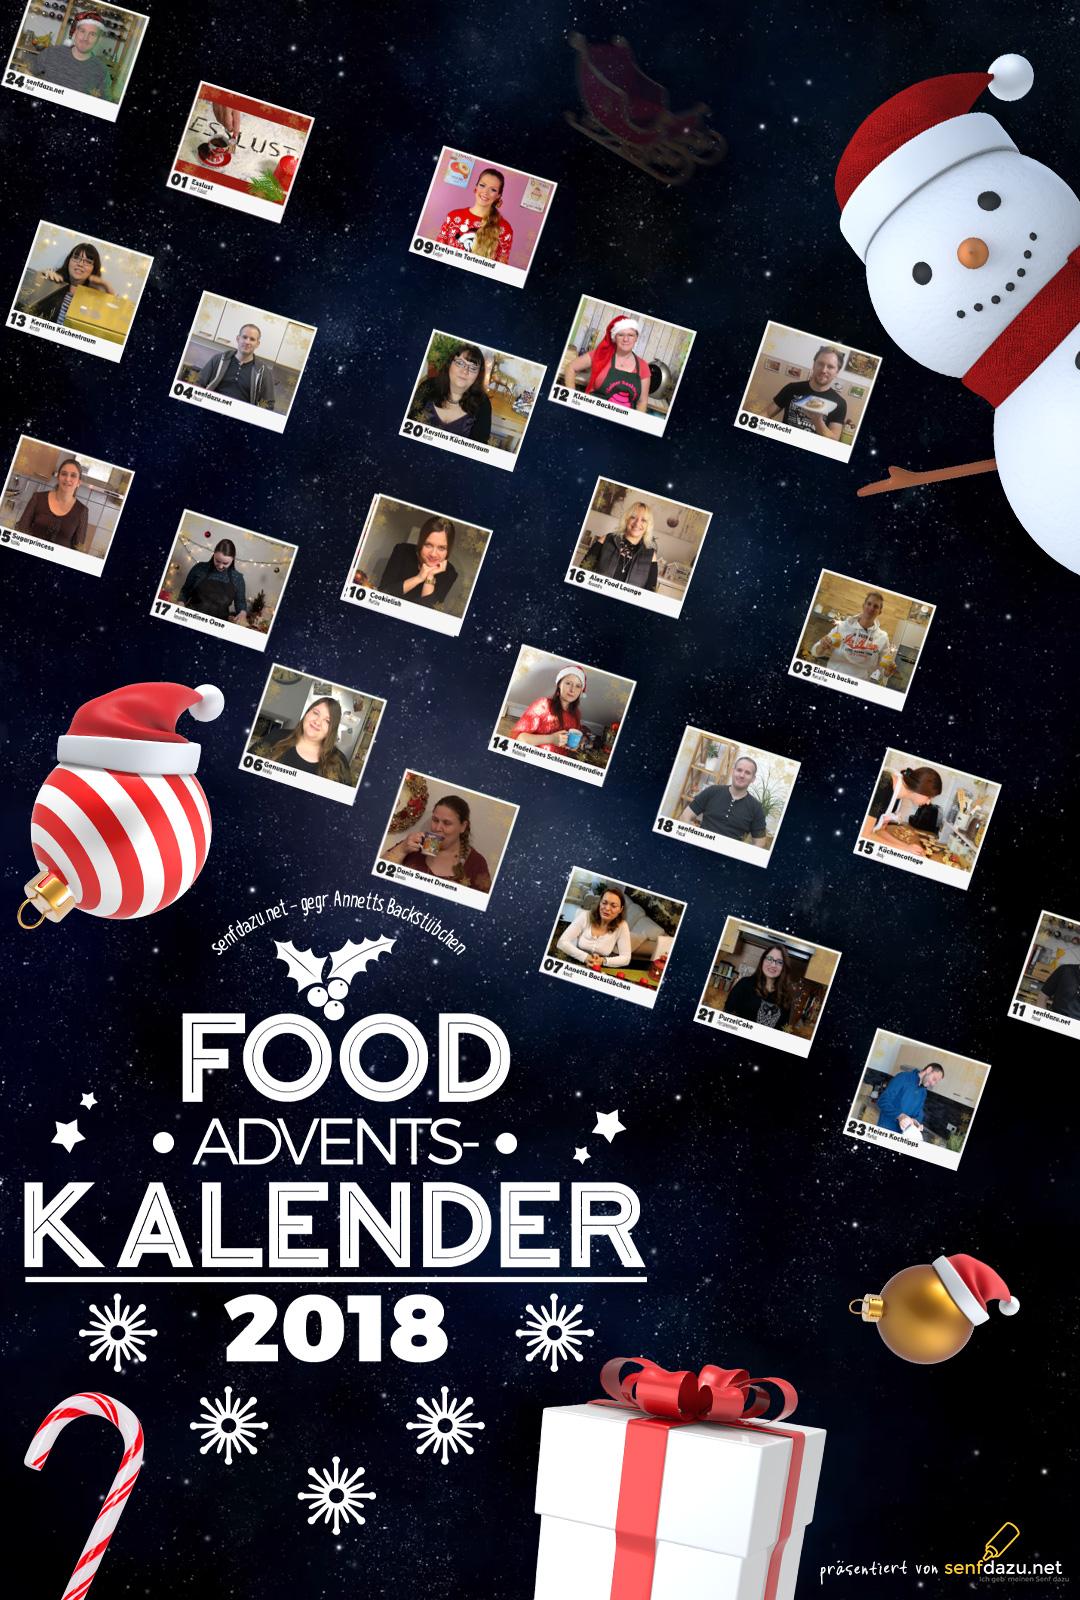 Food-Adventskalender 2018